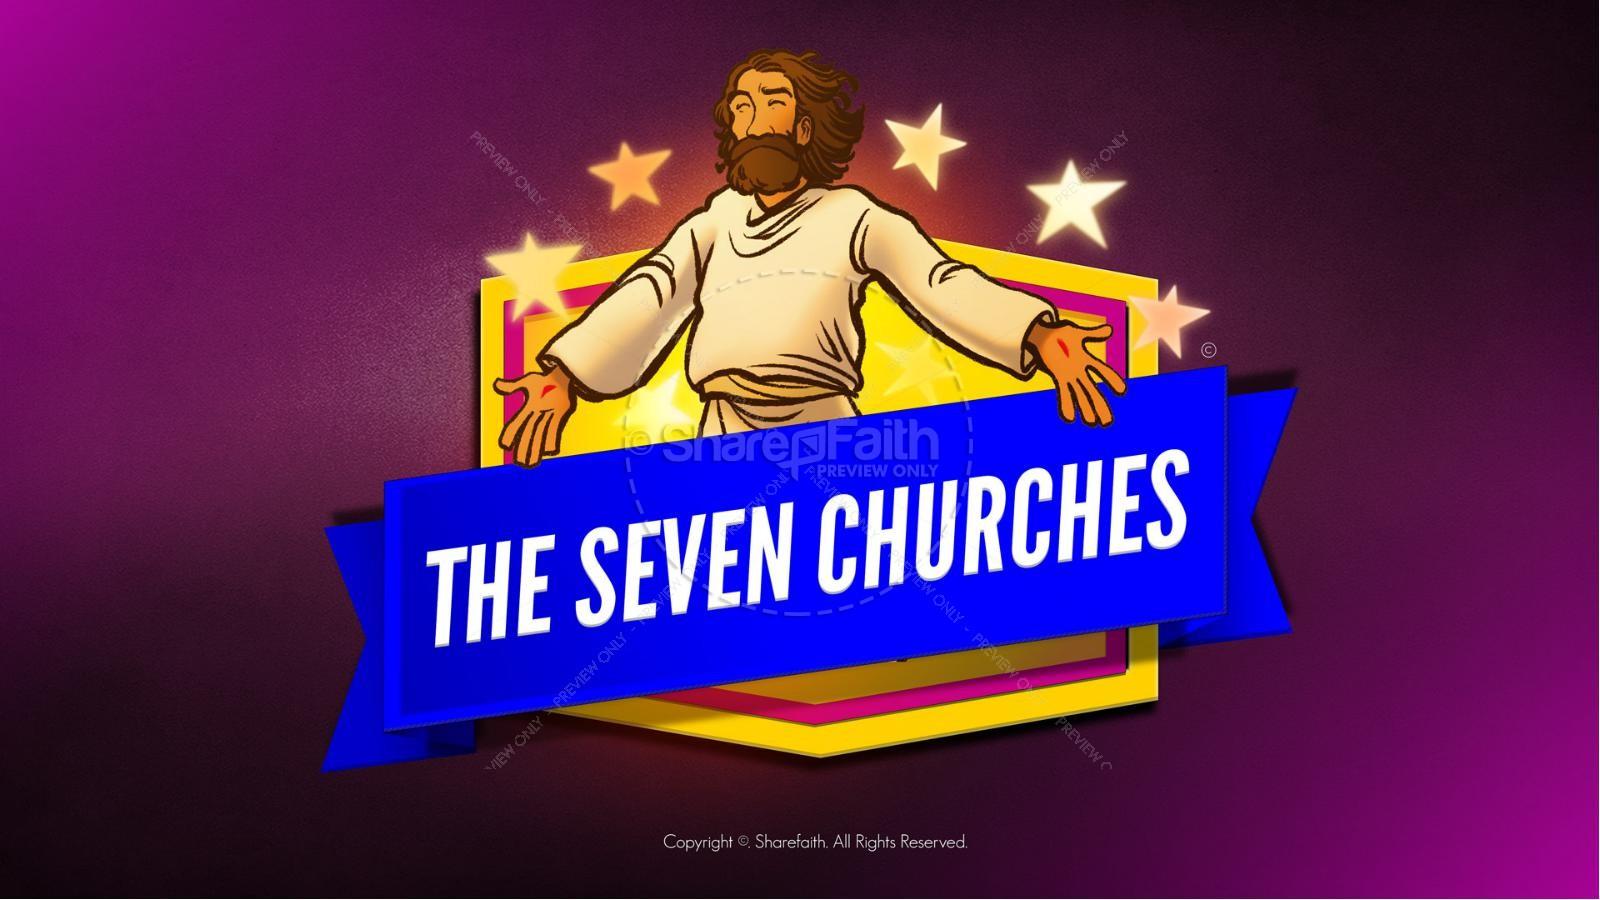 Revelation 2 3 The Seven Churches Kids Bible Story | slide 1